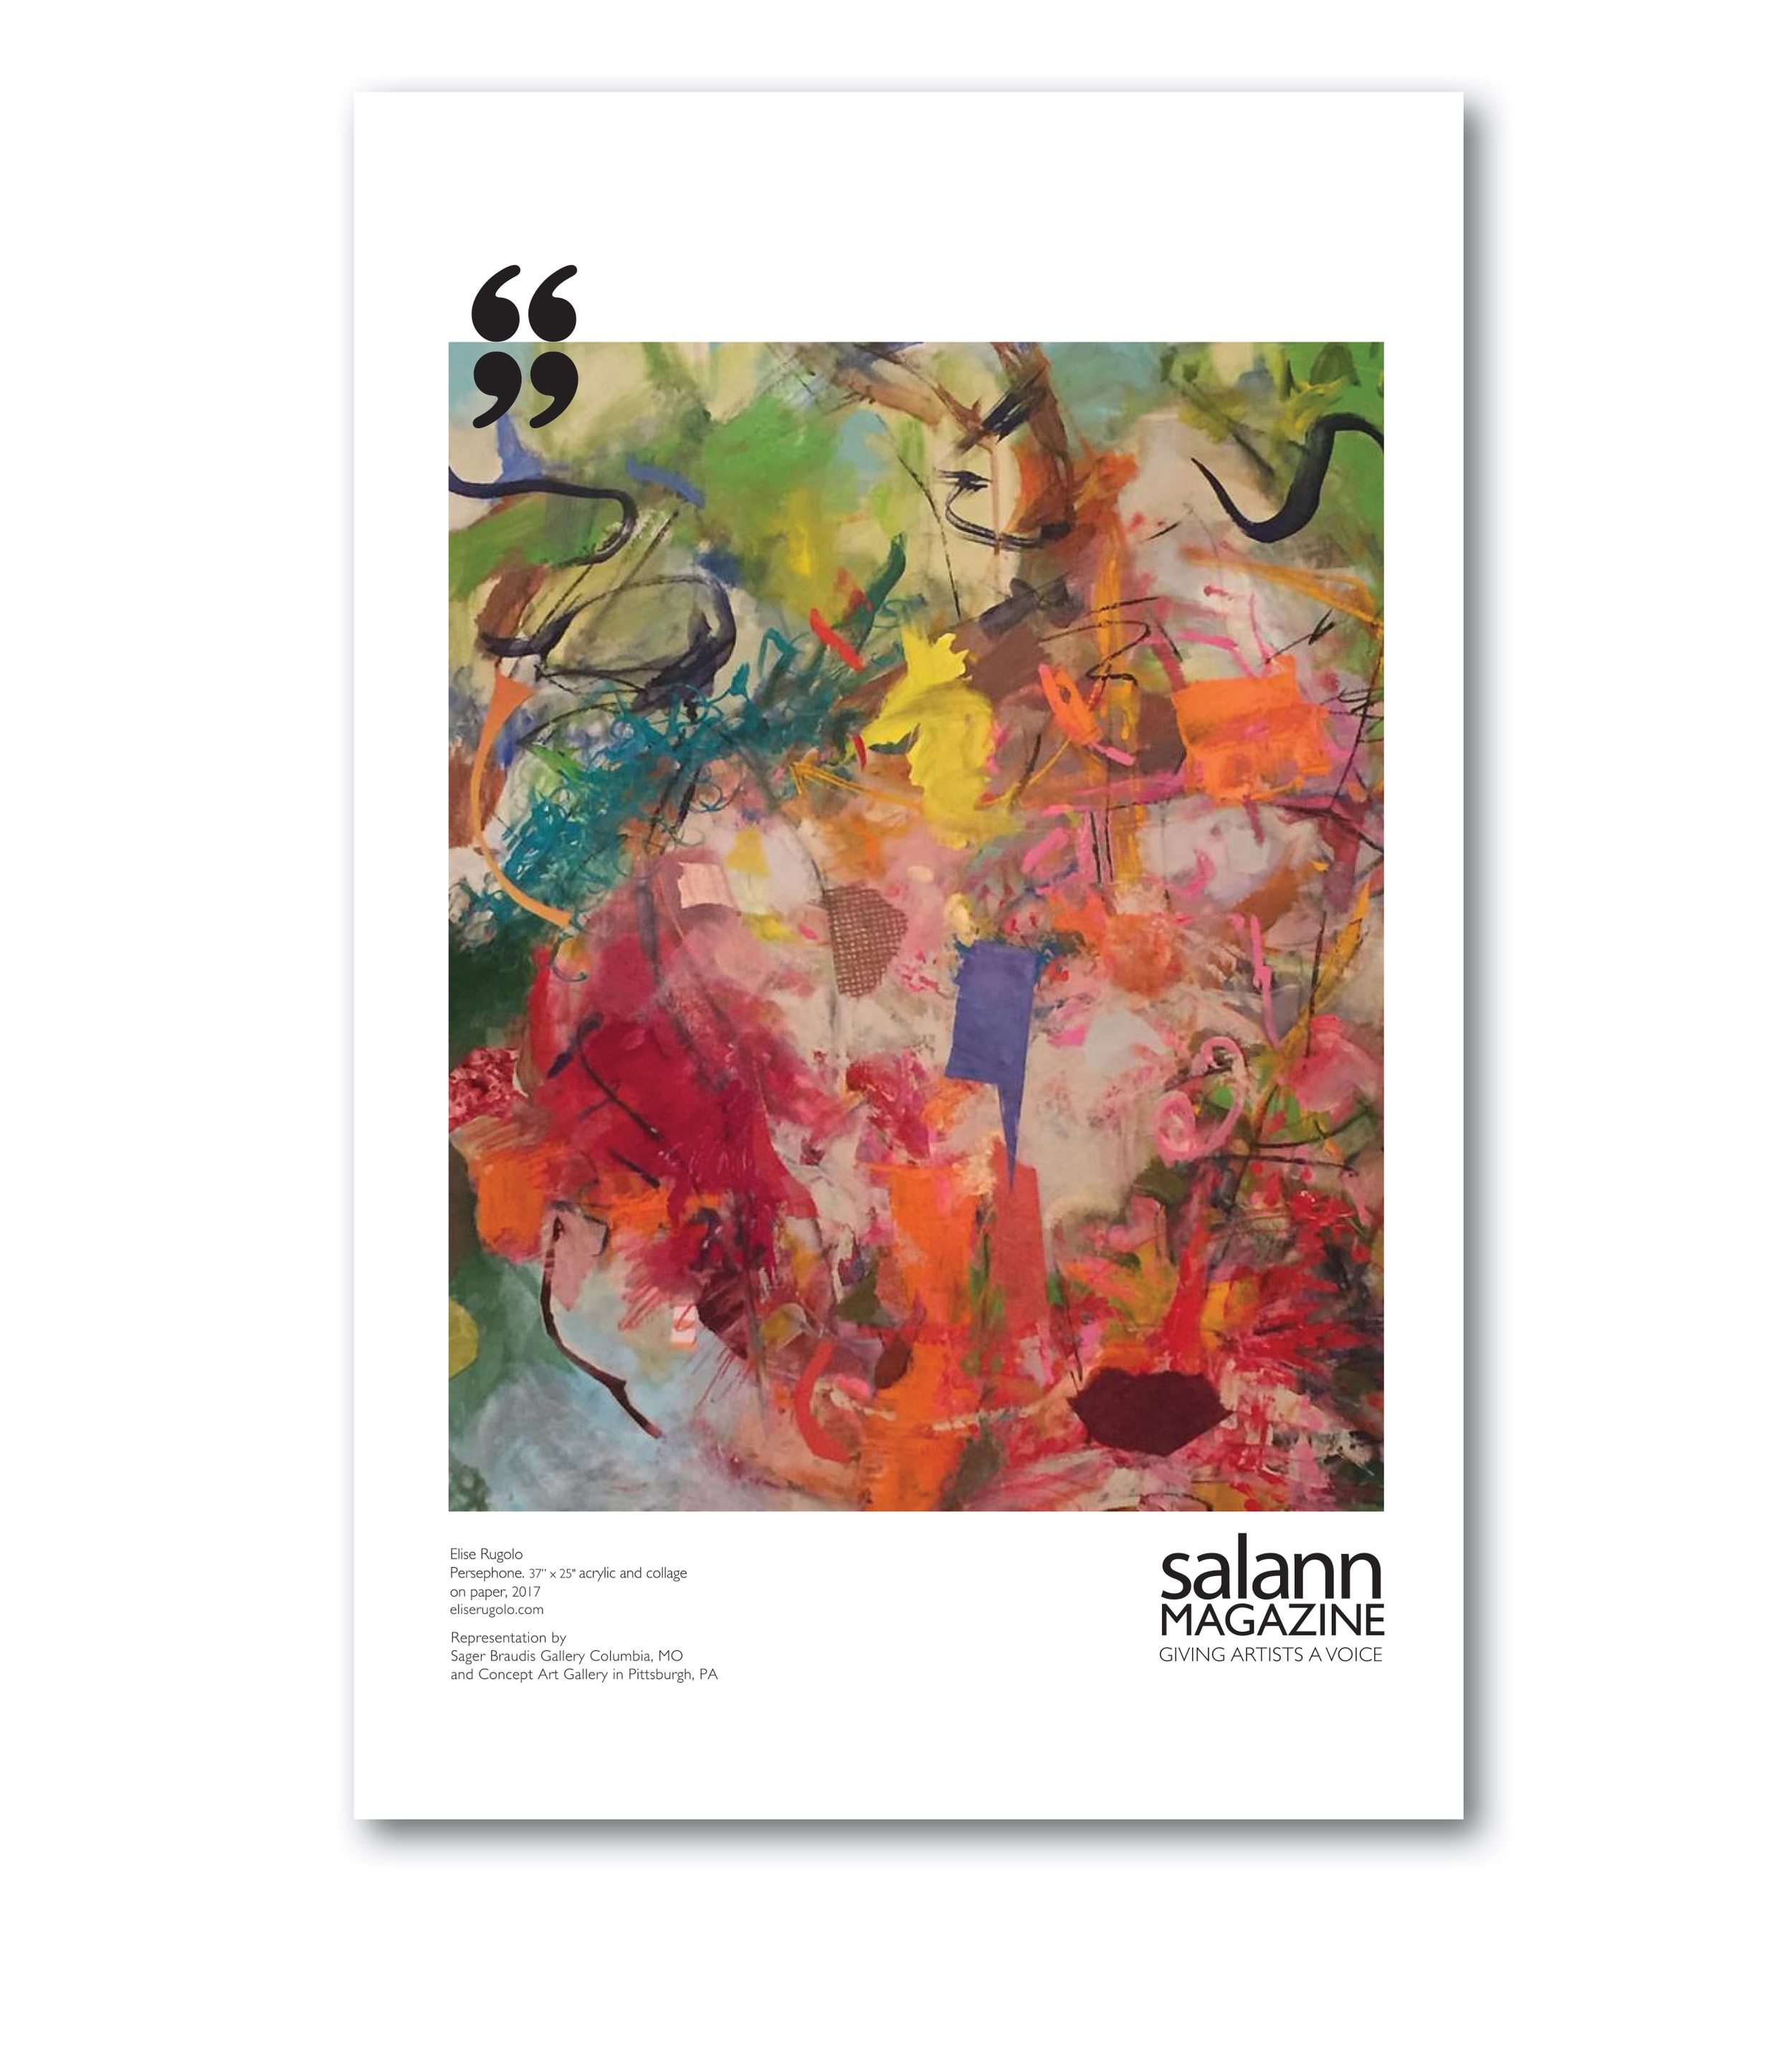 SalannMagazineCoverJulian2ndEditionWEB%2Bcopy.jpg